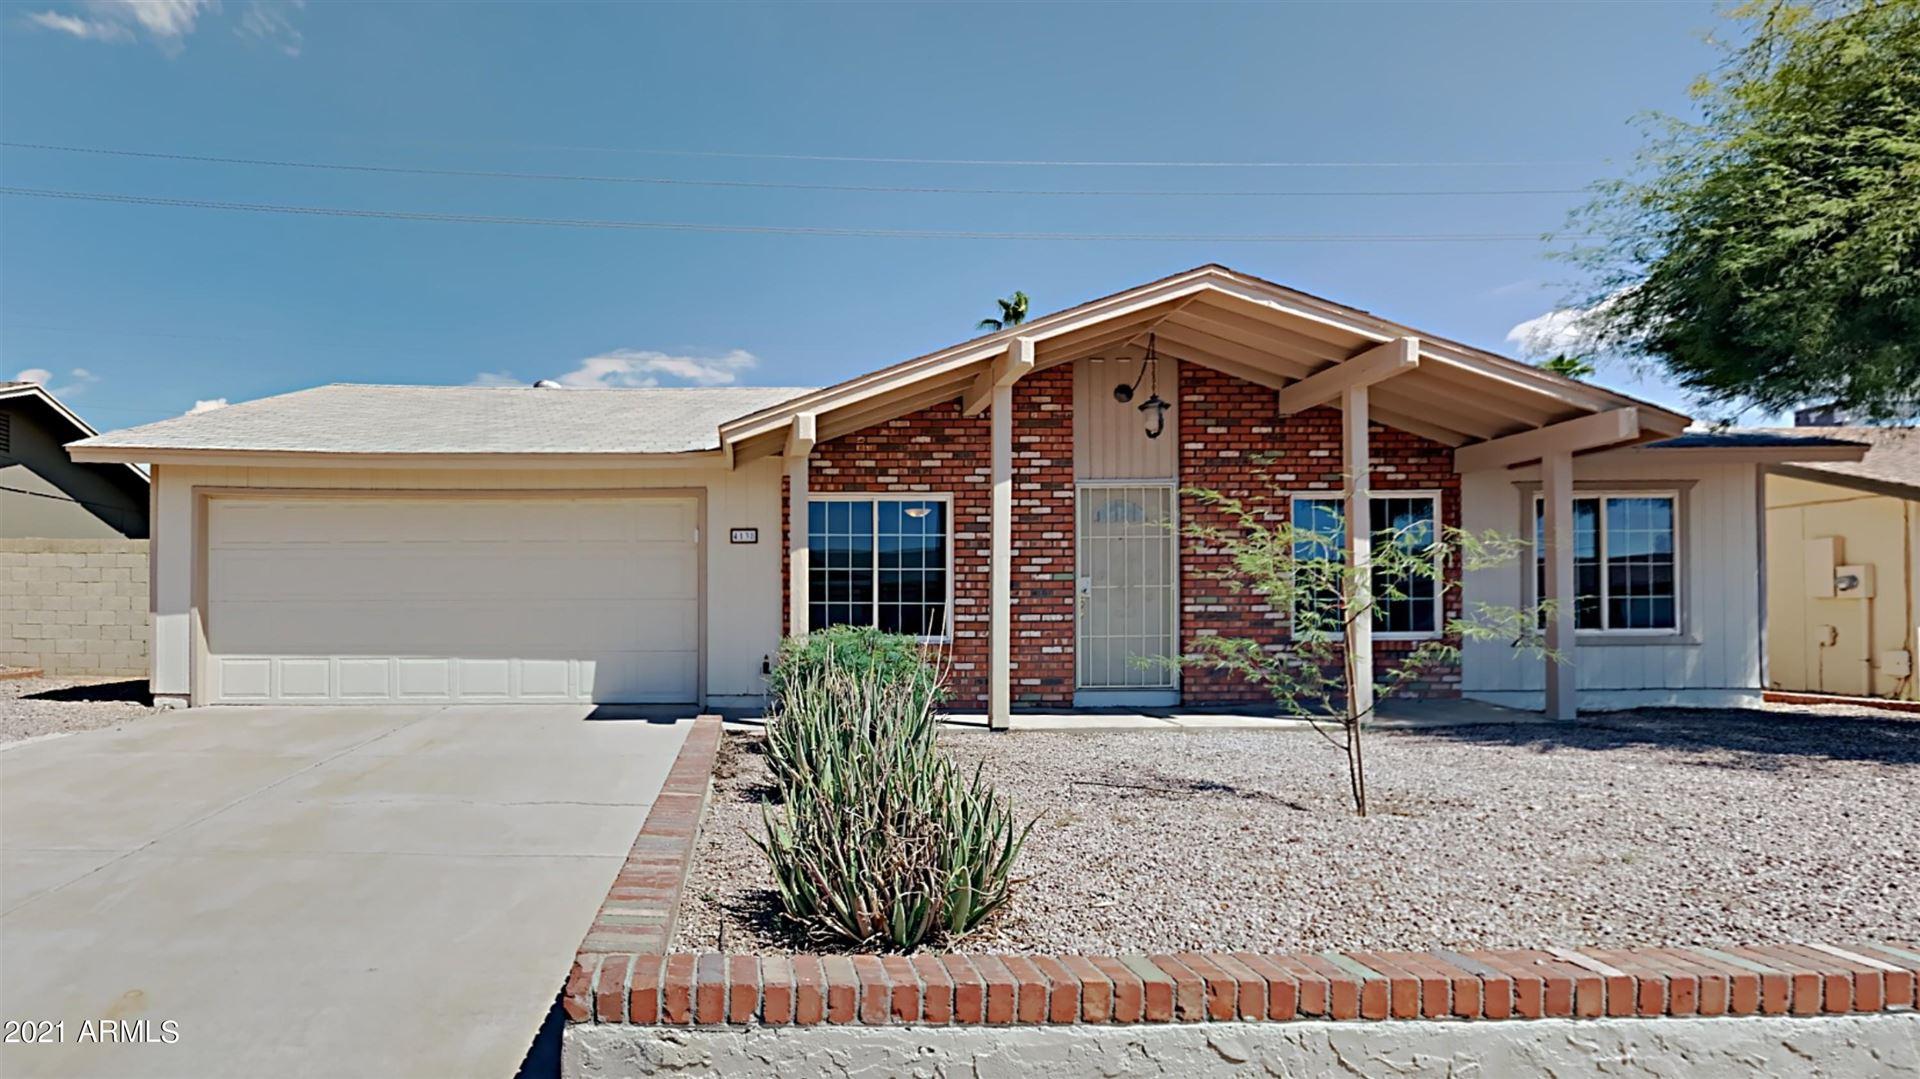 Photo of 4138 E Jicarilla Street, Ahwatukee, AZ 85044 (MLS # 6284298)